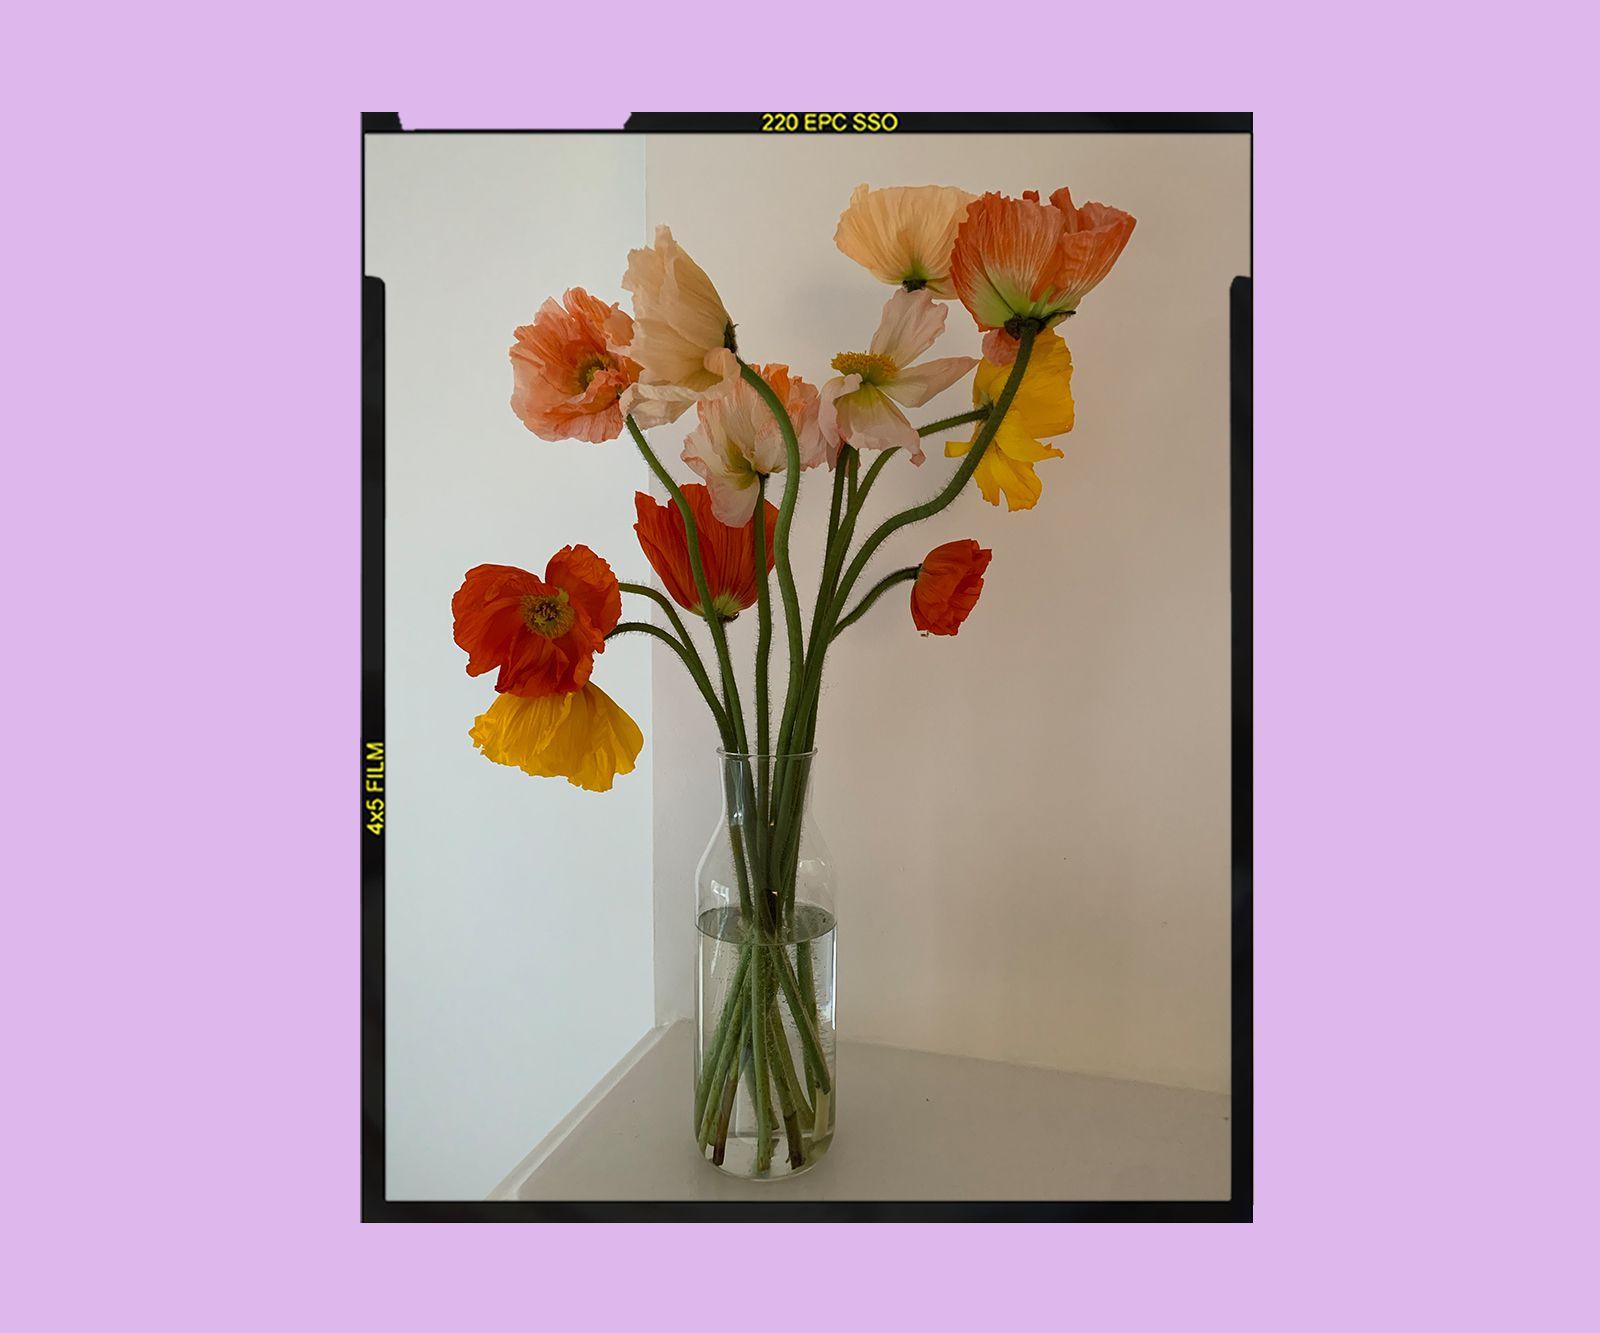 Olivia Cooke's Flowers